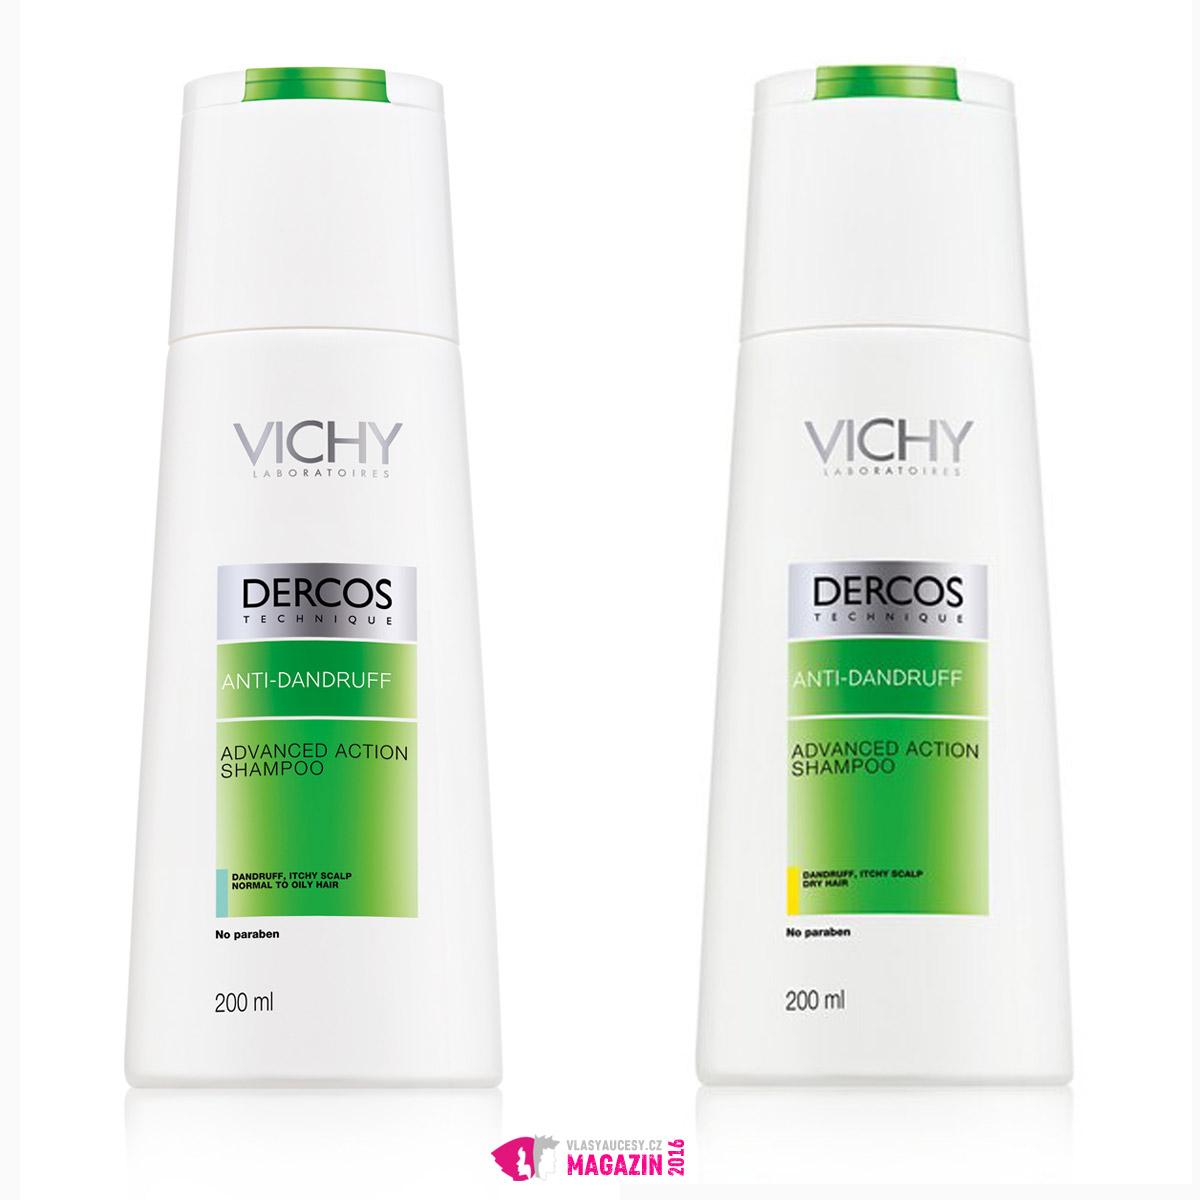 "<p class=""p5"">1. <a href=""http://www.anrdoezrs.net/links/7863143/type/dlg/https://www.krasa.cz/dercos-sampon-proti-lupum-pro-suche-vlasy.html"" target=""_blank"">Vichy Šampon proti lupům pro suché vlasy Dercos 200 ml: Cena 335 Kč →</a></p> <p class=""p5"">2. <a href=""http://www.anrdoezrs.net/links/7863143/type/dlg/https://www.krasa.cz/dercos-sampon-proti-lupum-pro-normalni-az-mastne-vlasy.html"" target=""_blank"">Vichy Šampon proti lupům pro normální až mastné vlasy Dercos 200 ml: Cena 329 Kč→</a></p>"